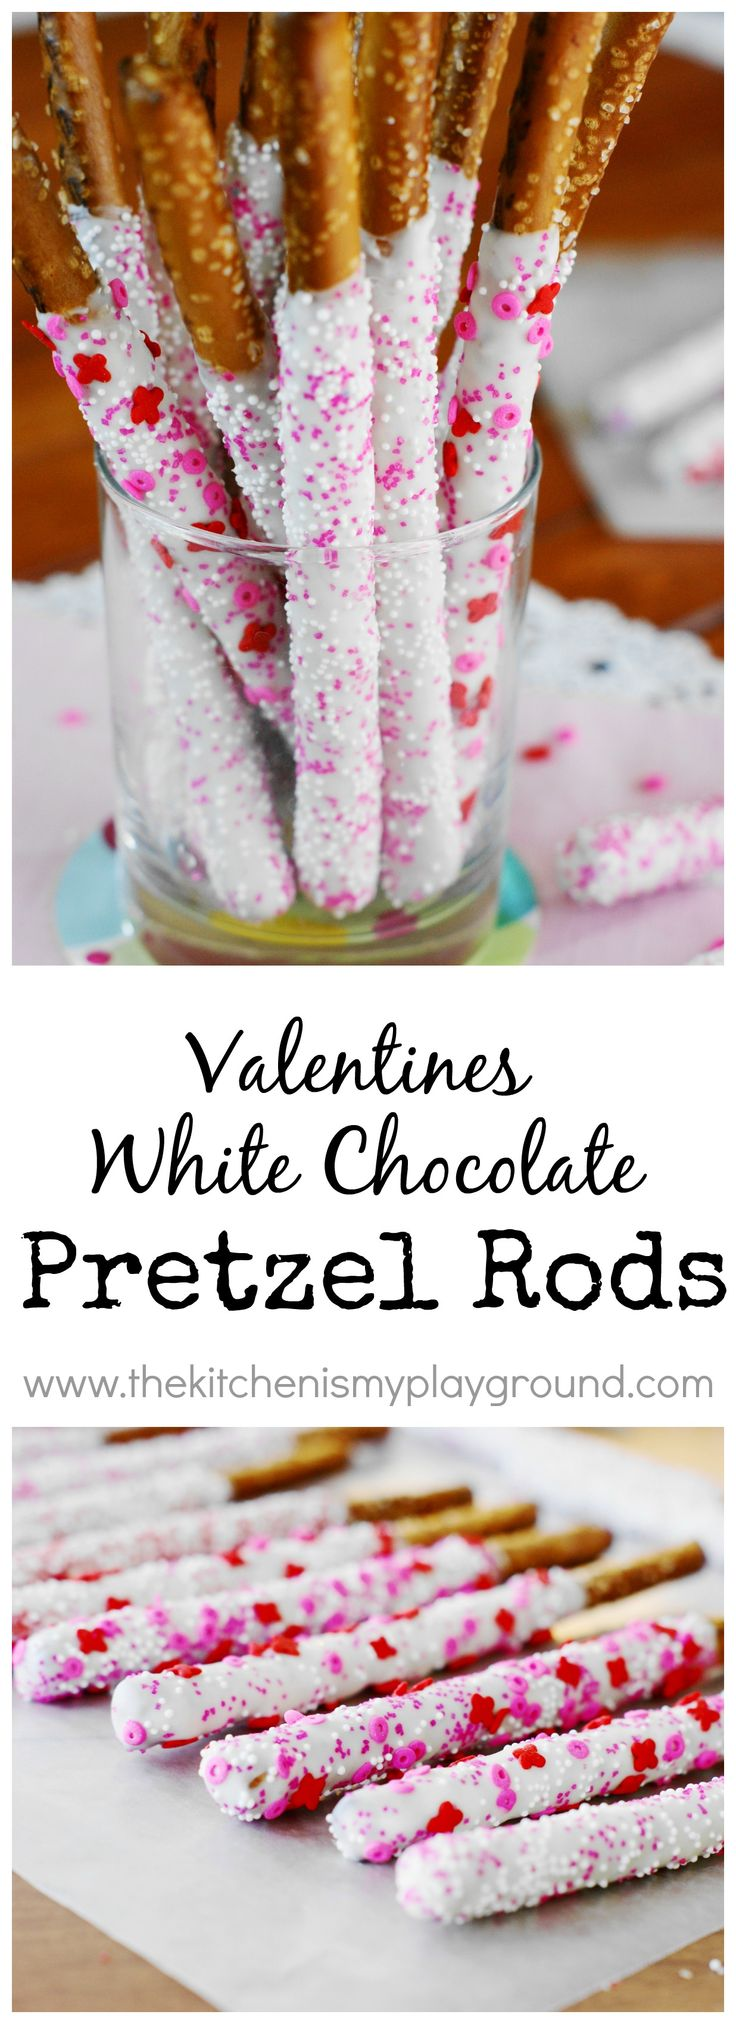 92 best pretzels rods images on Pinterest | Chocolate candies ...